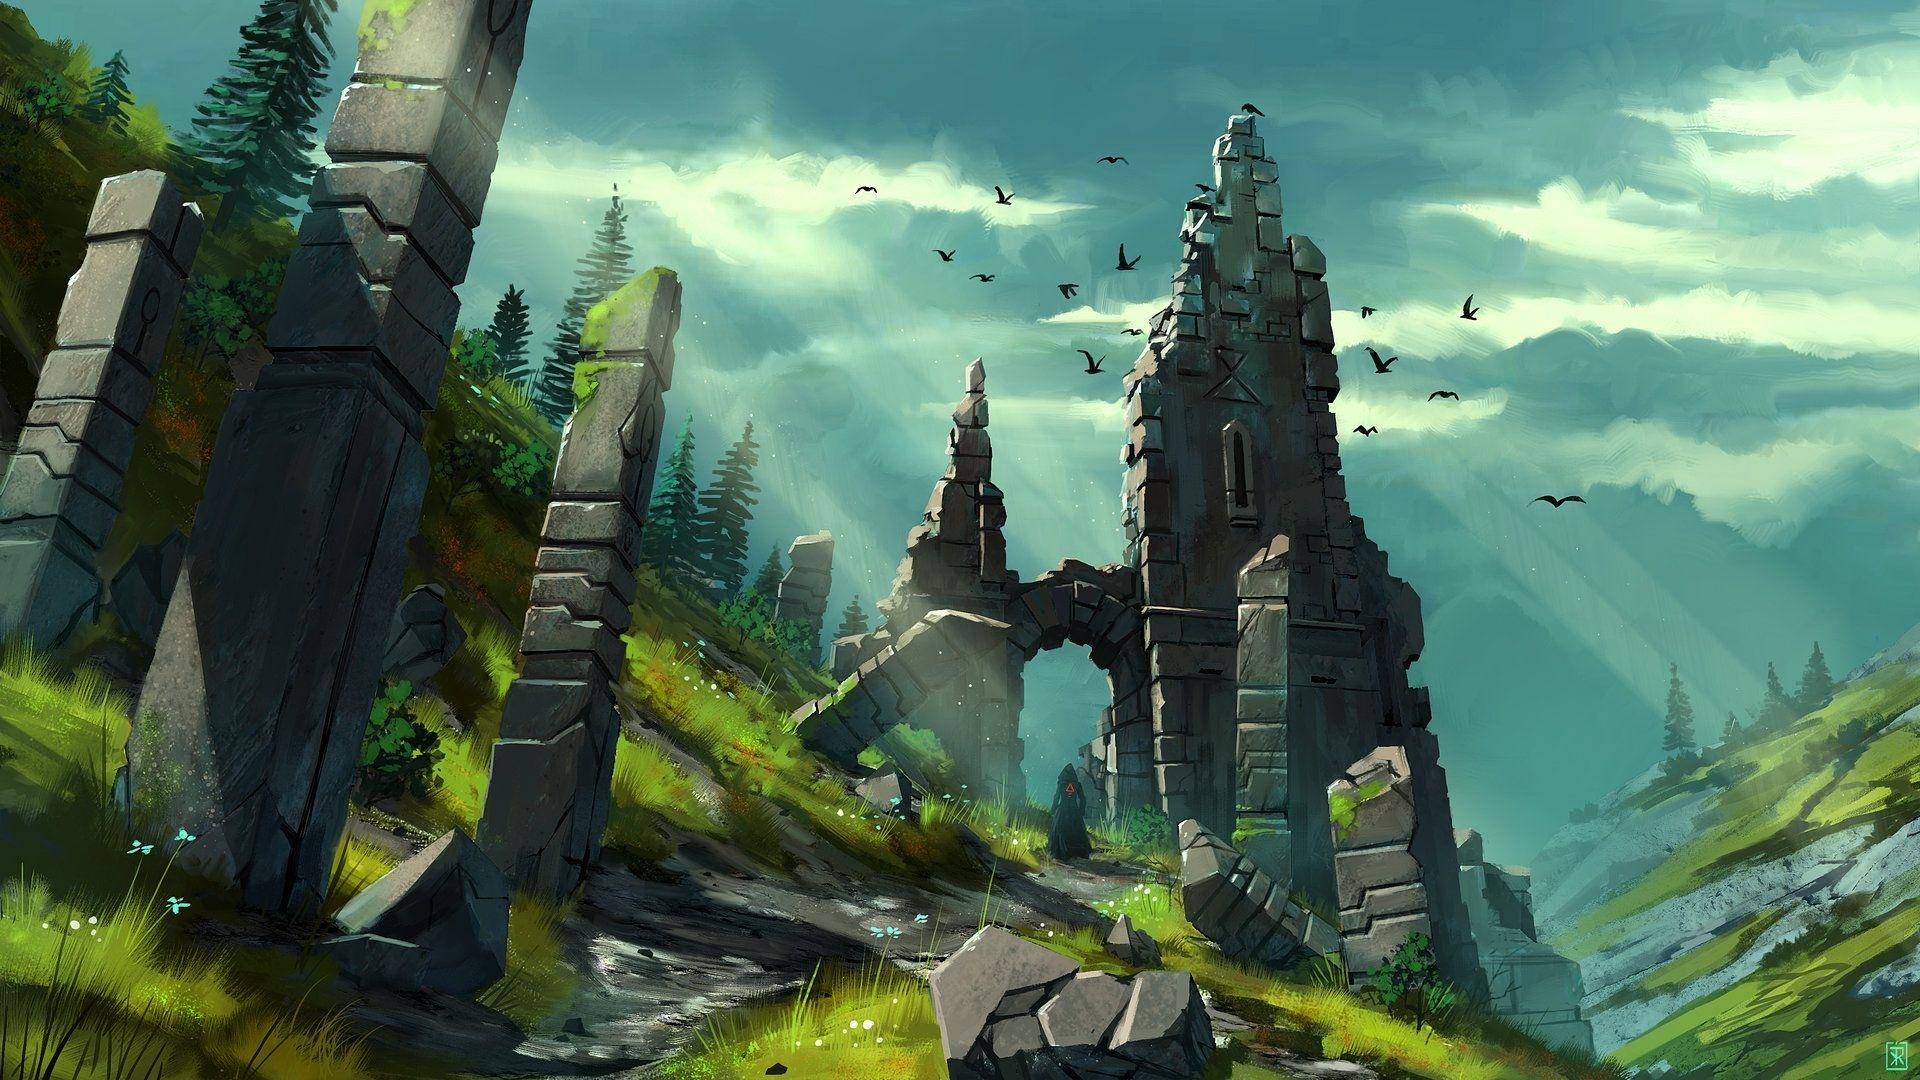 Ruins Art free image